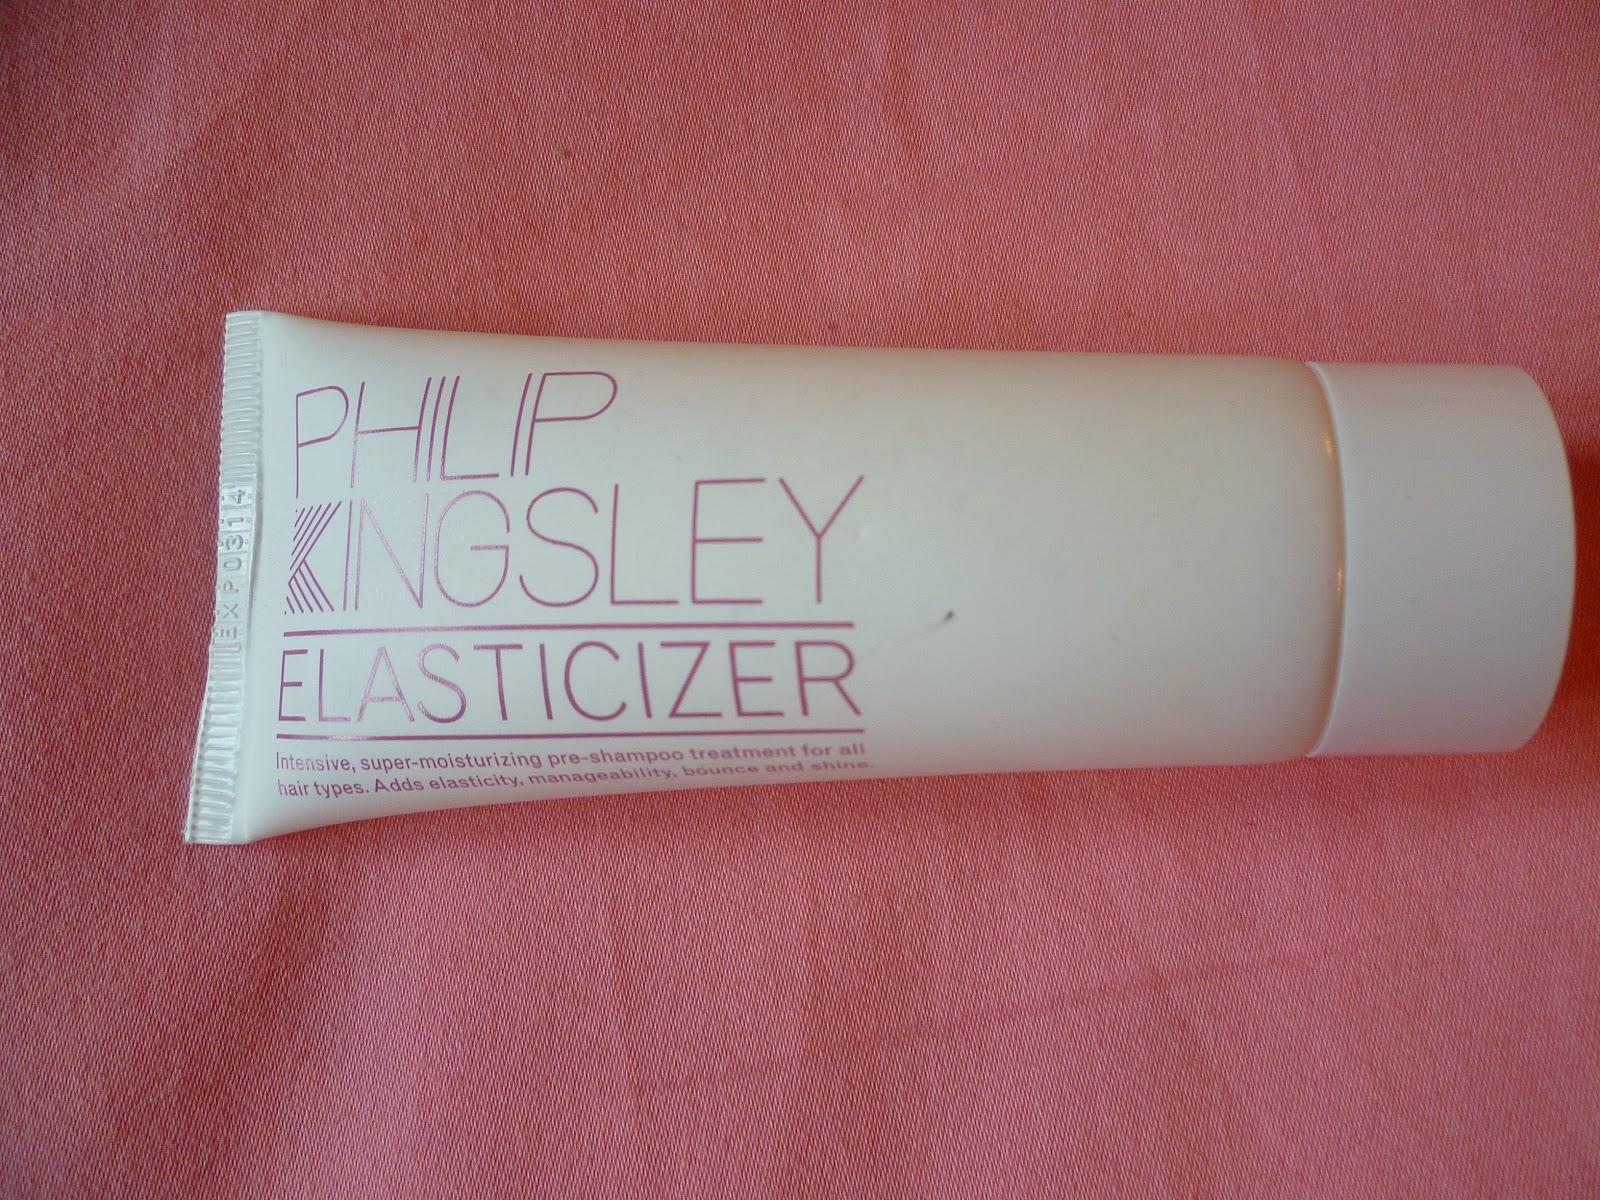 philip kingsley elasticizer how to use